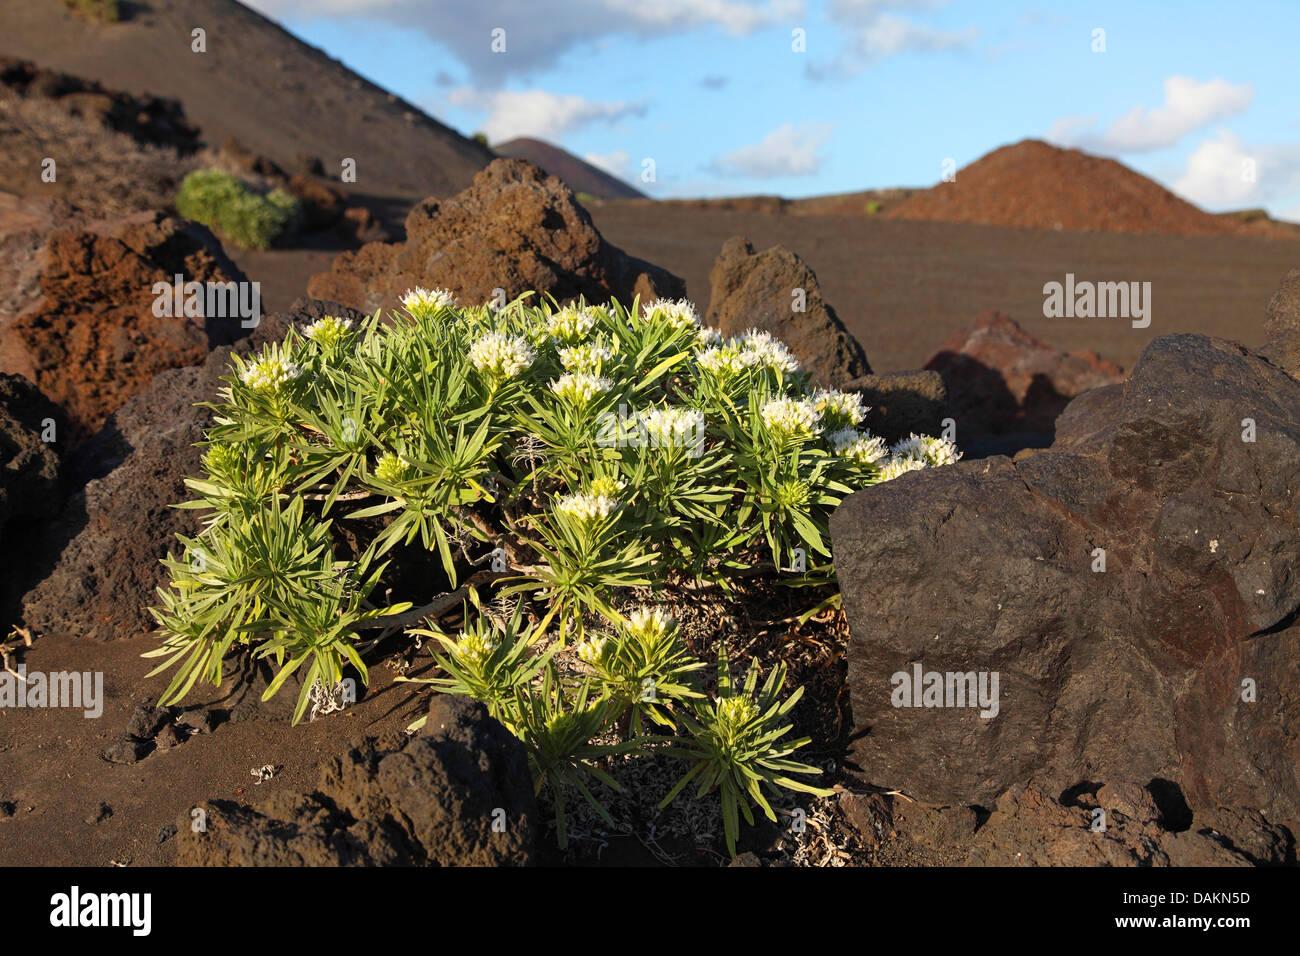 bugloss (Echium brevirame), bugloss growing in lava field, Canary Islands, La Palma, Fuencaliente - Stock Image